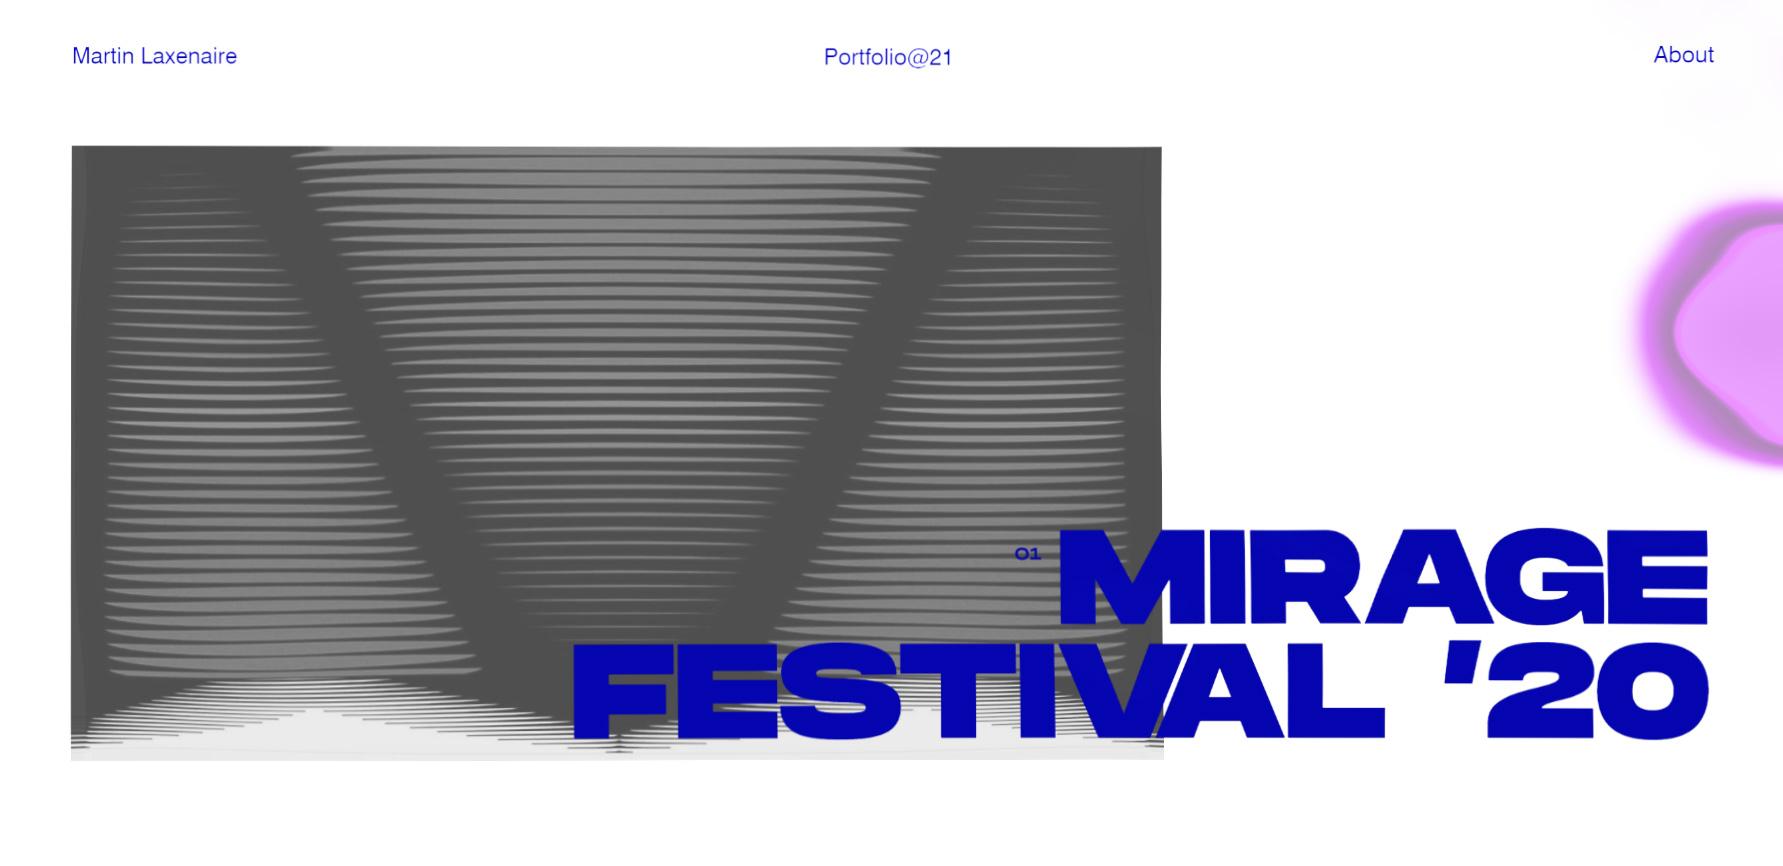 Martin Laxenaire '21 Portfolio - Website of the Day